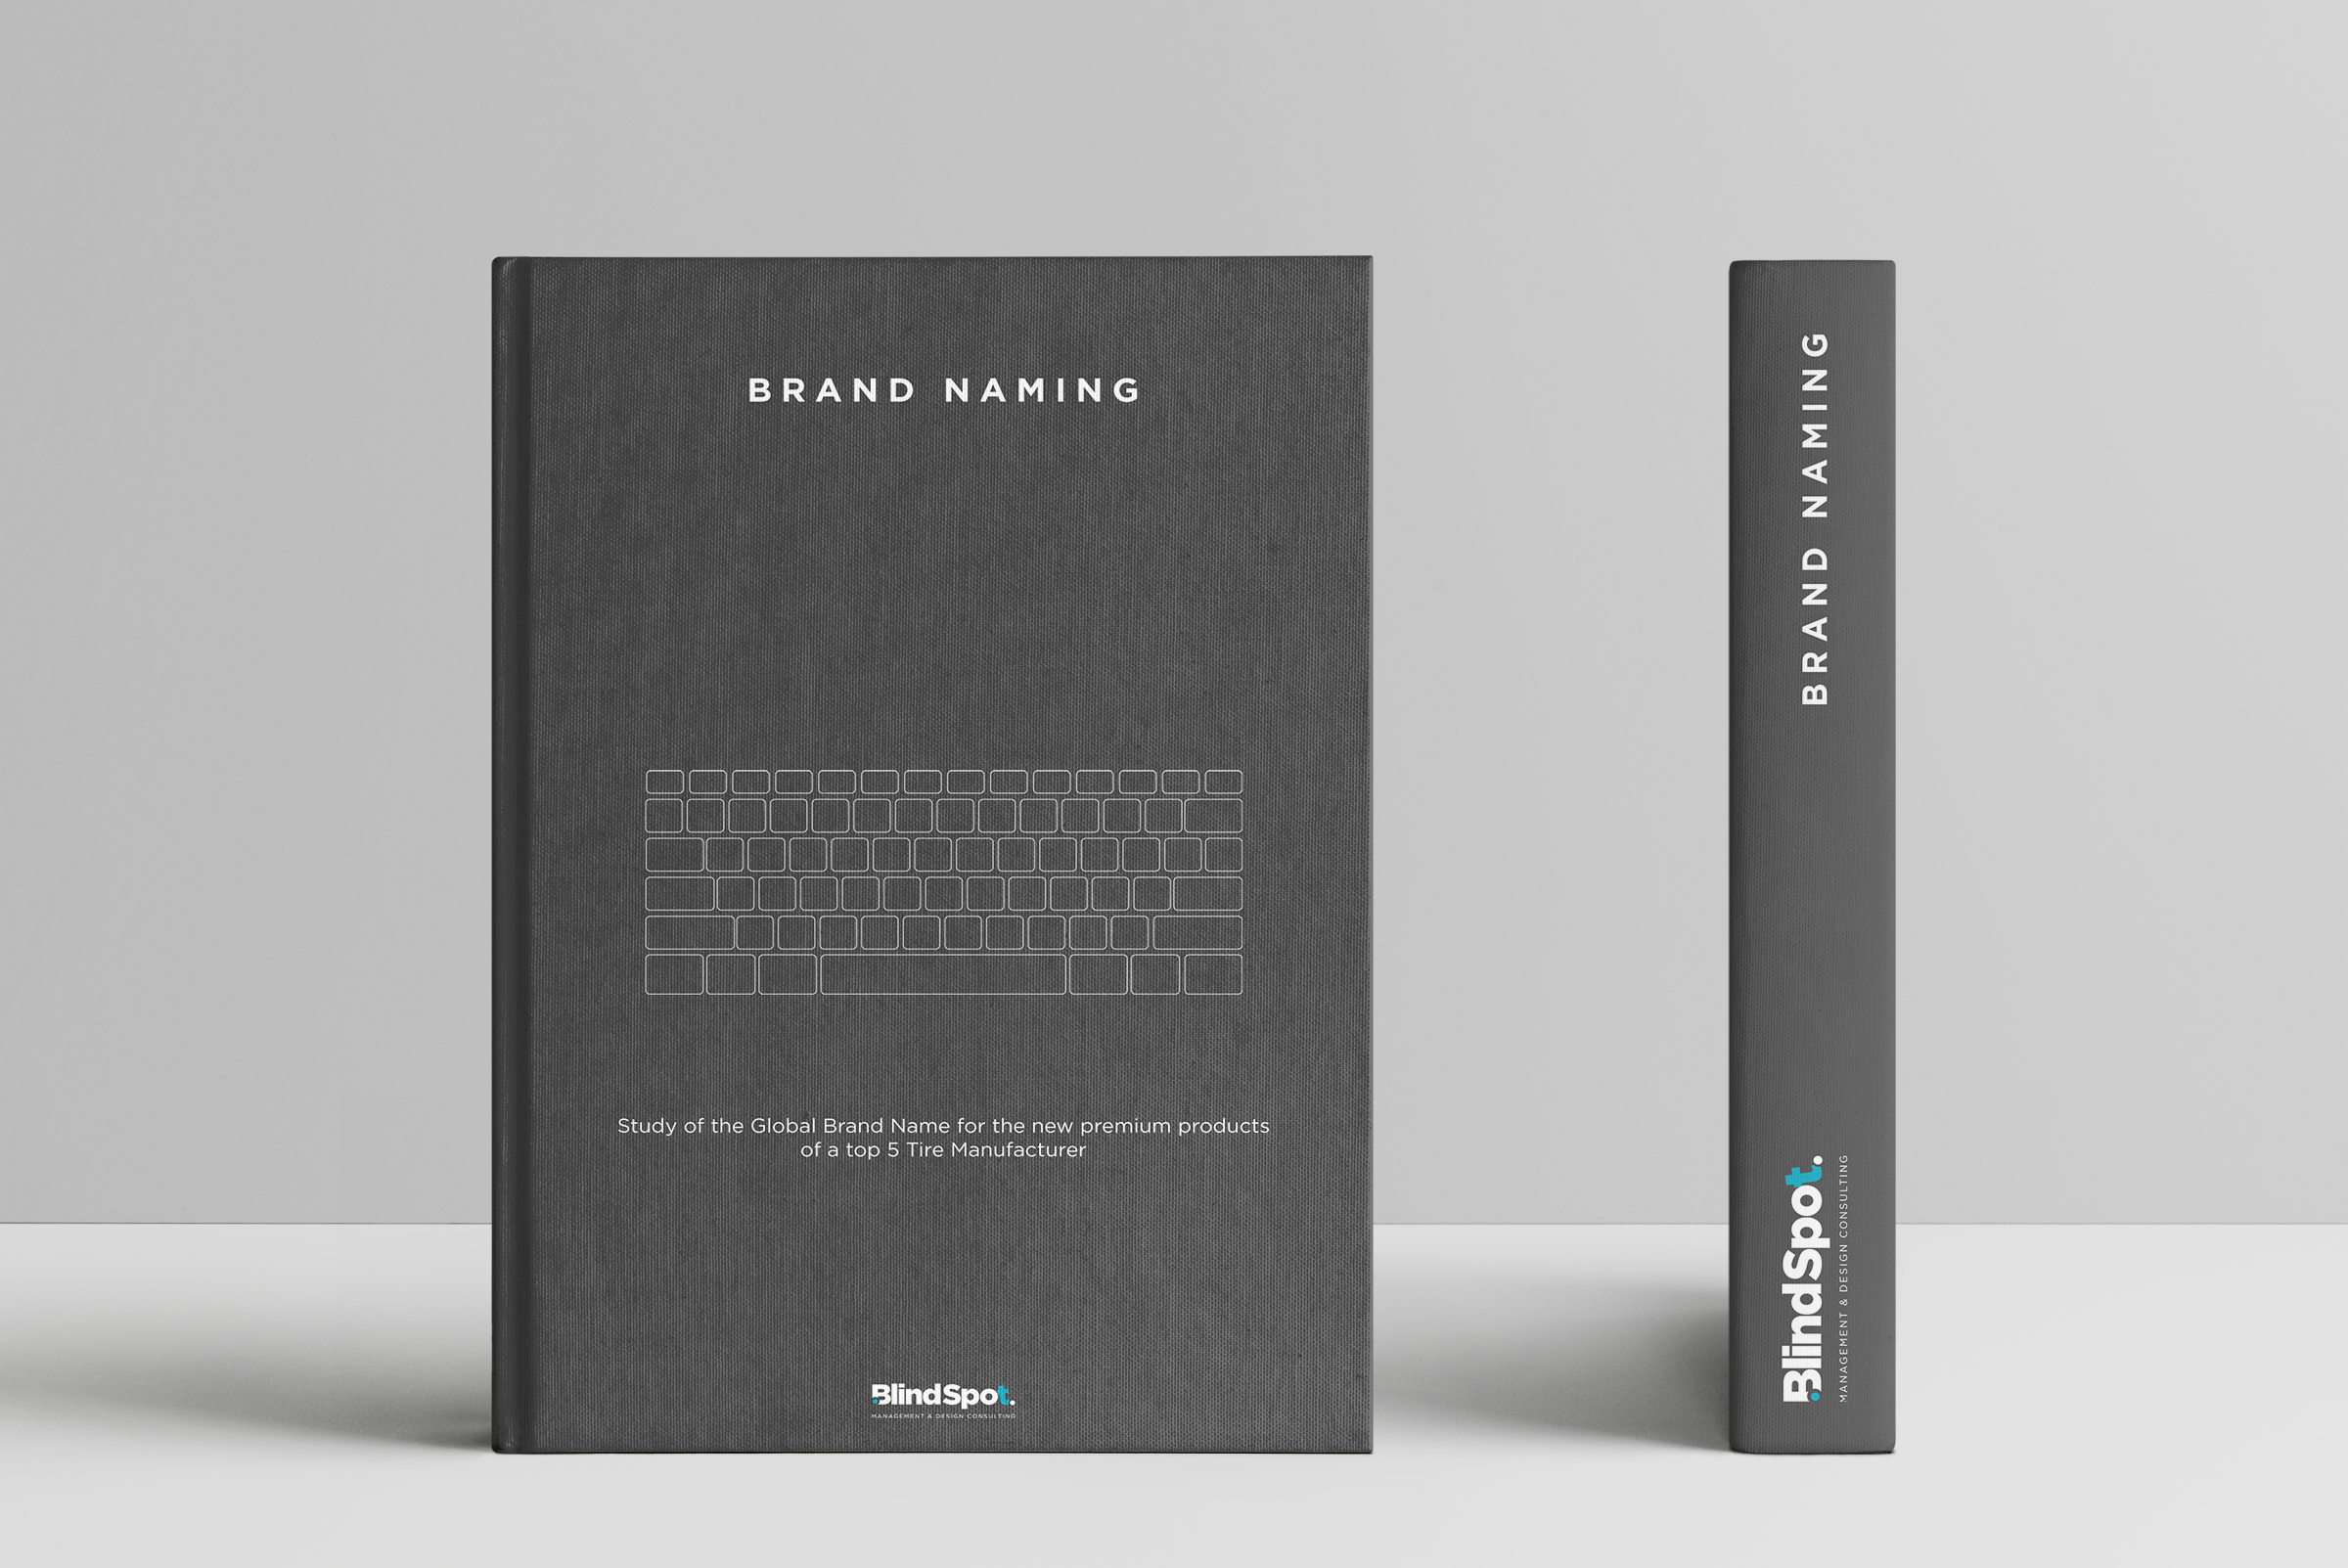 BlindSpot Brand Value Gray Book